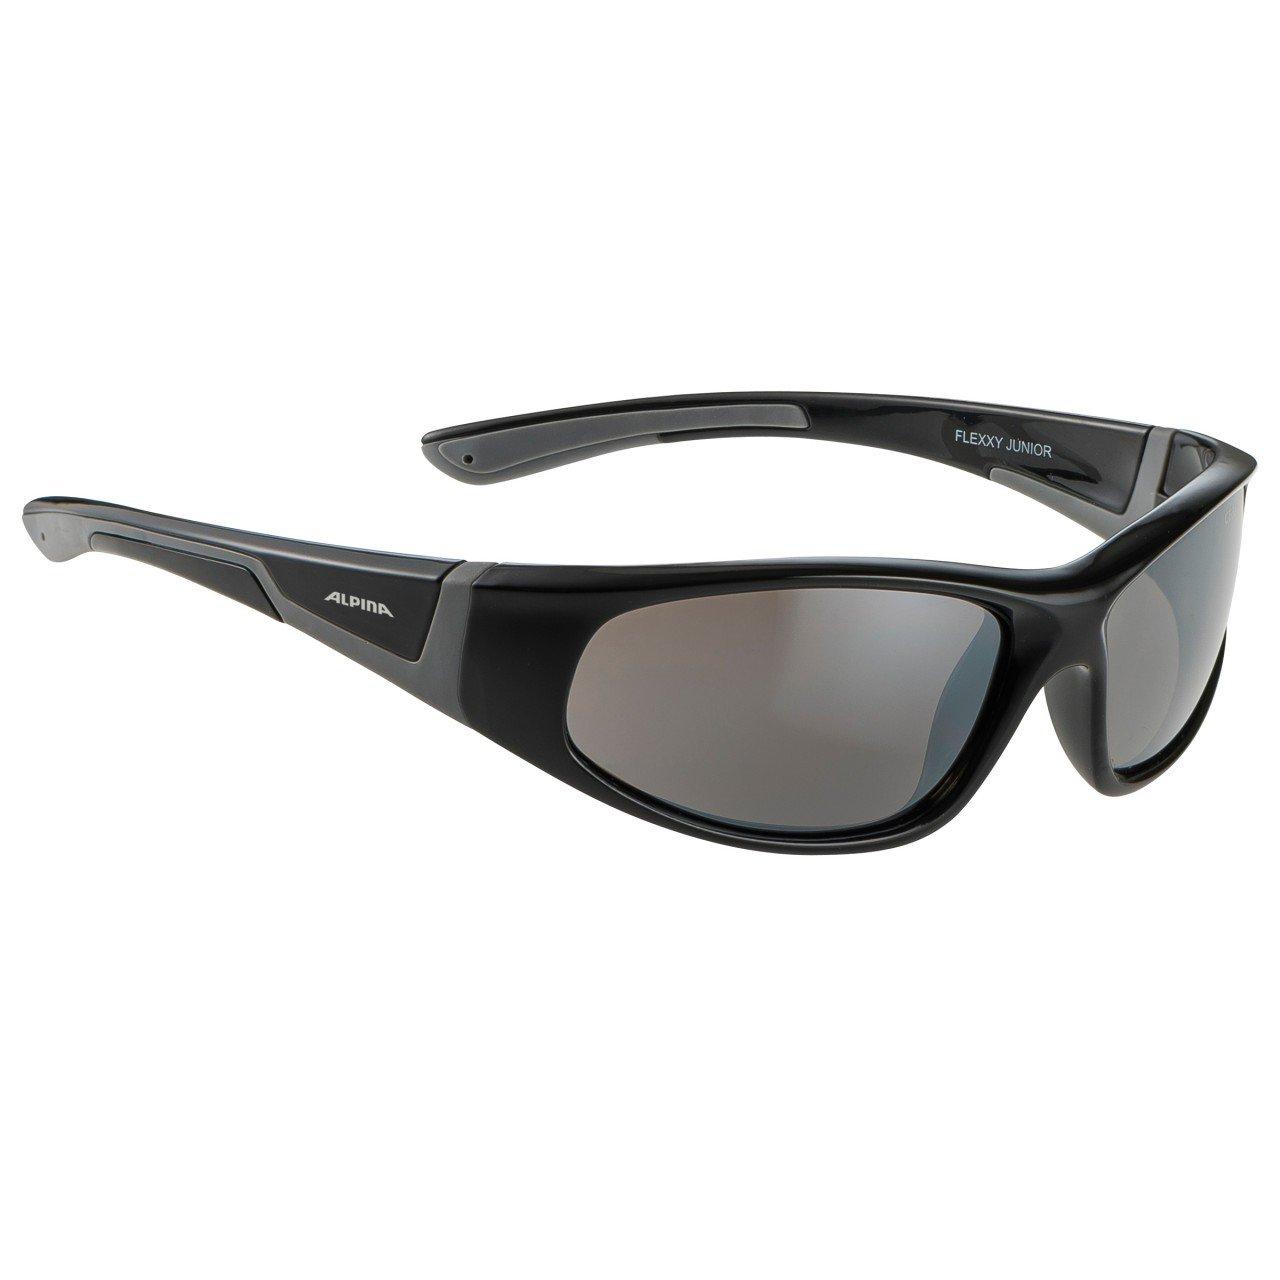 ALPINA Unisex - Kinder, FLEXXY JUNIOR Sportbrille, black-grey gloss, One Size